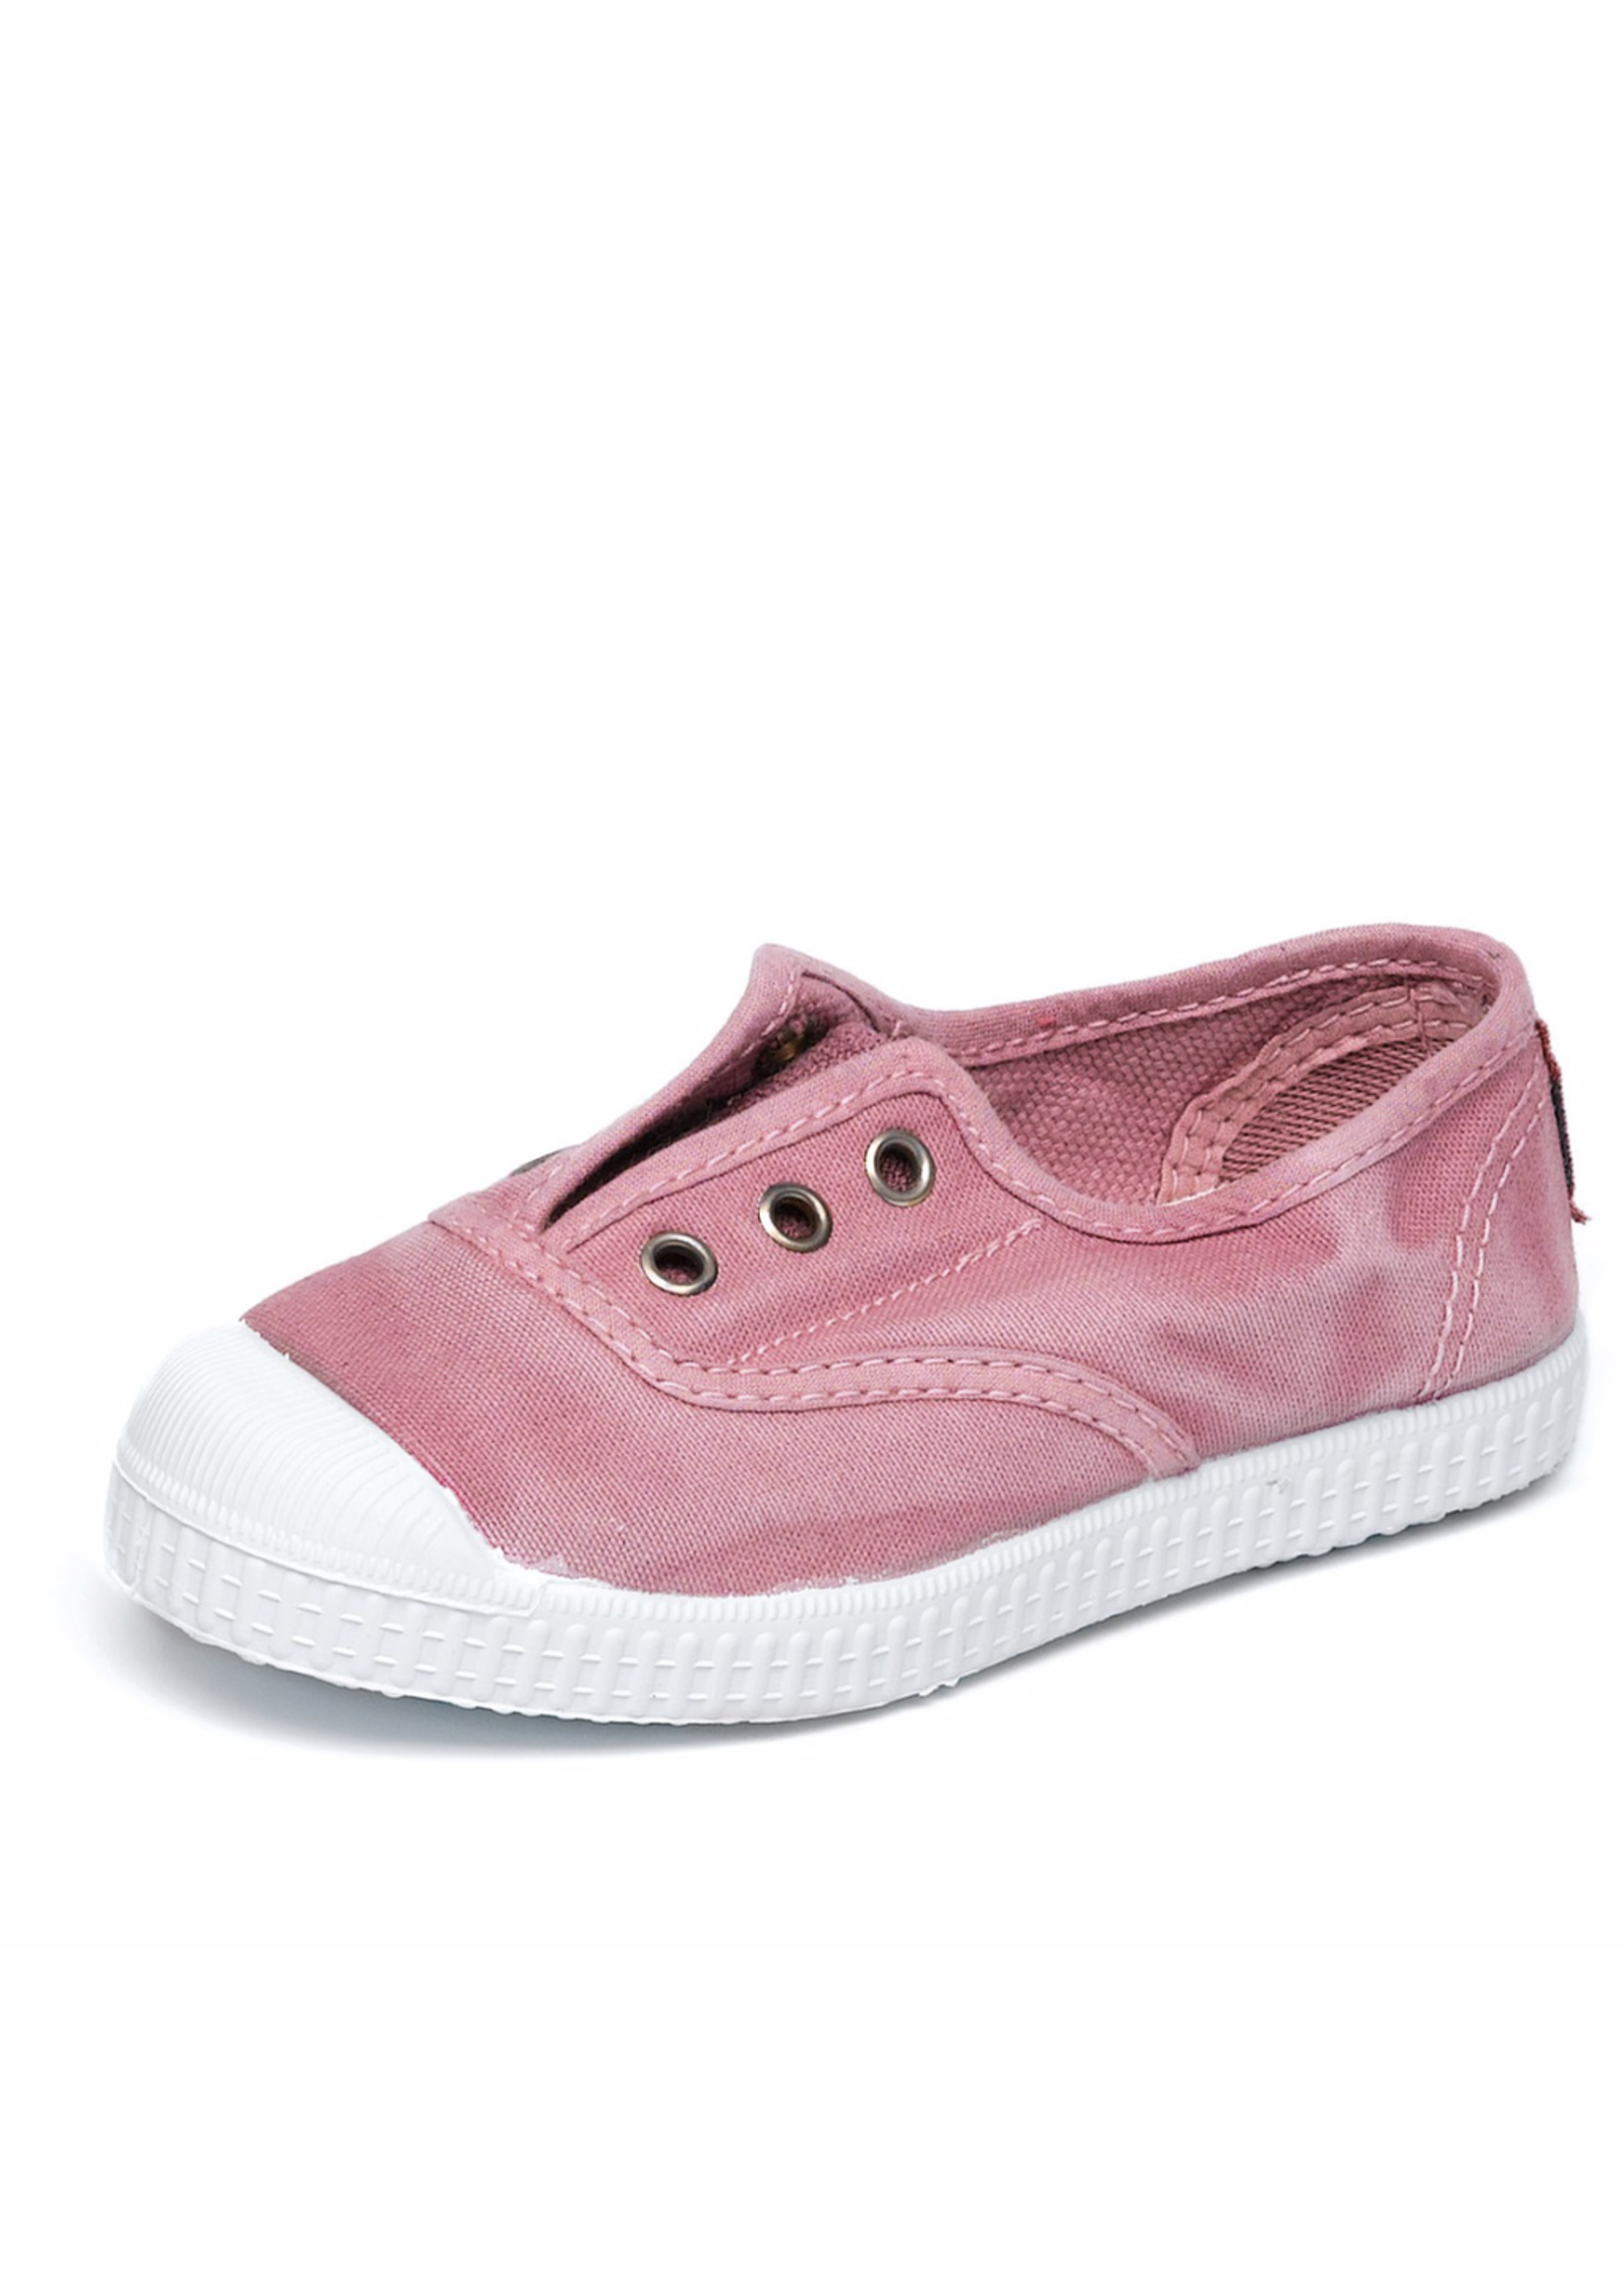 Cienta Cienta Adult Sneakers (Rosa)